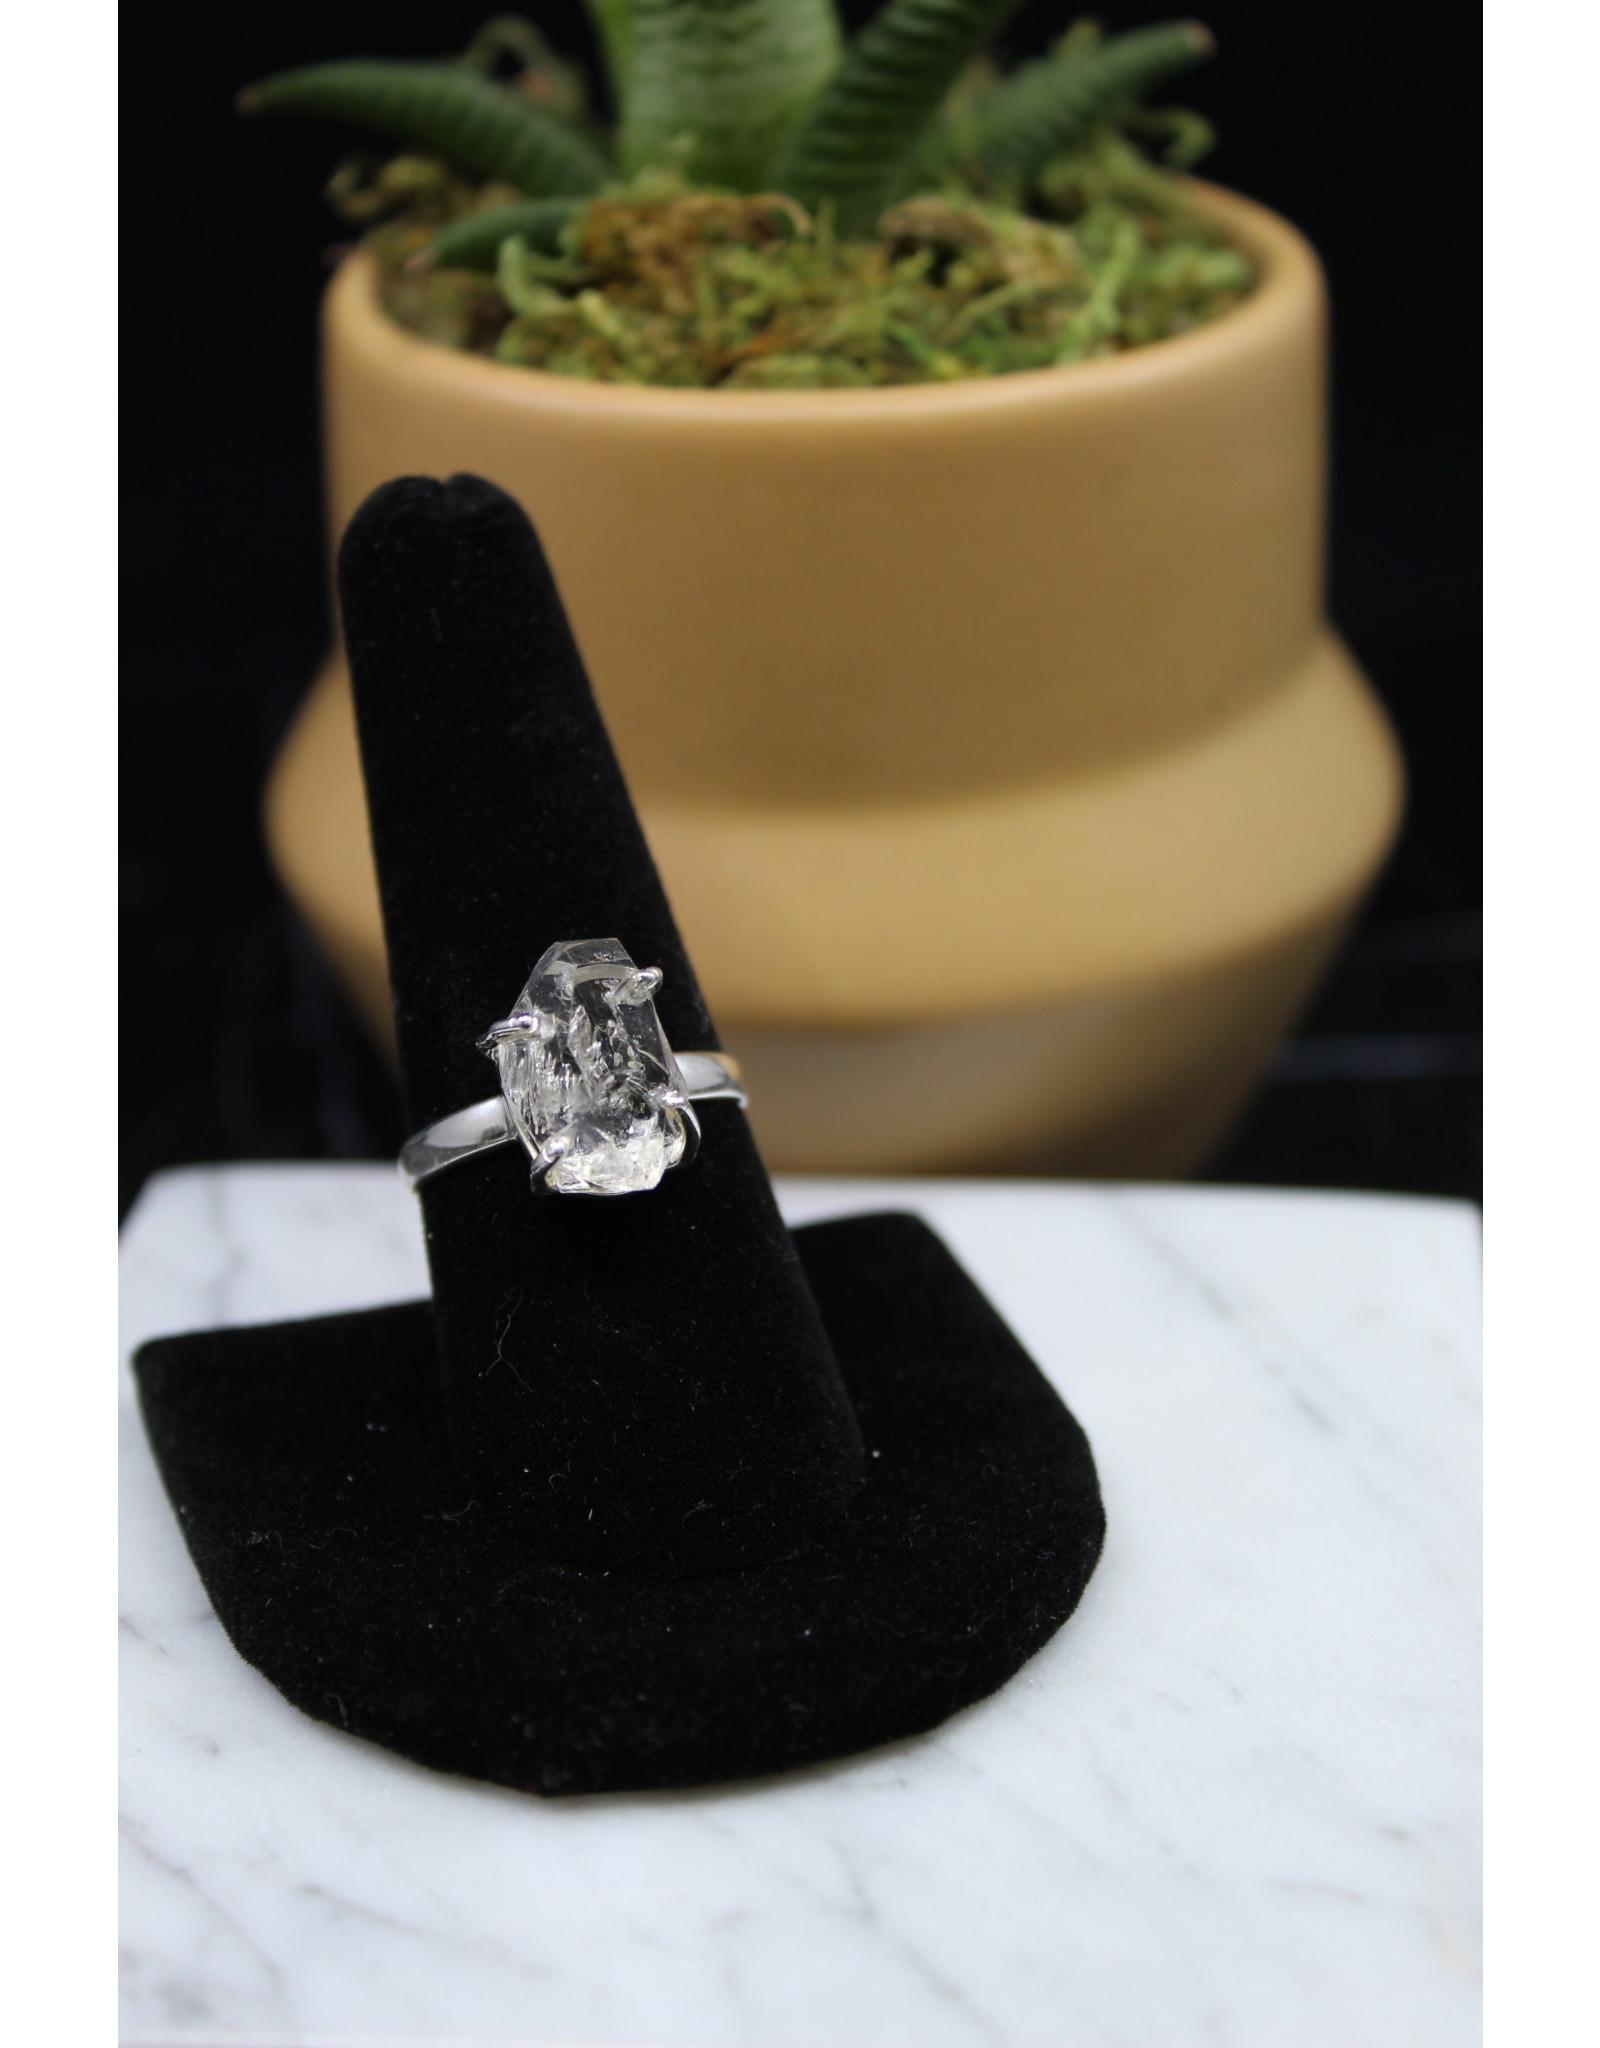 Clear Quartz Ring - Size 9